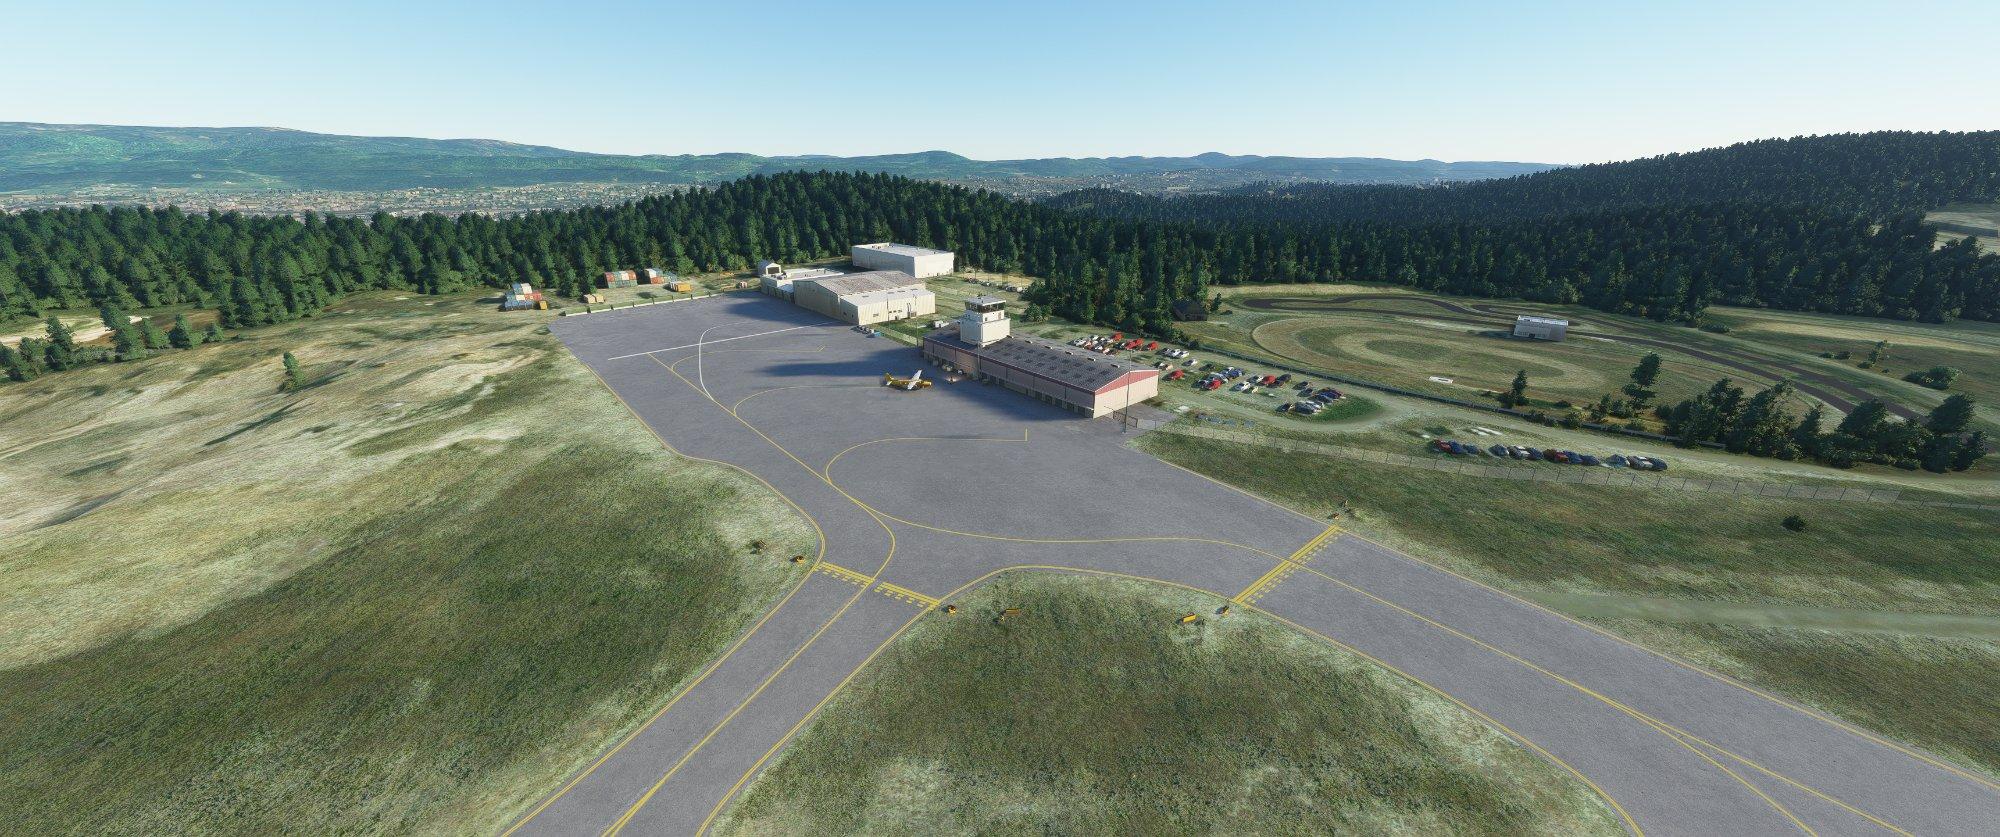 Microsoft Flight Simulator Screenshot 2020.10.30 - 16.26.18.24.jpg